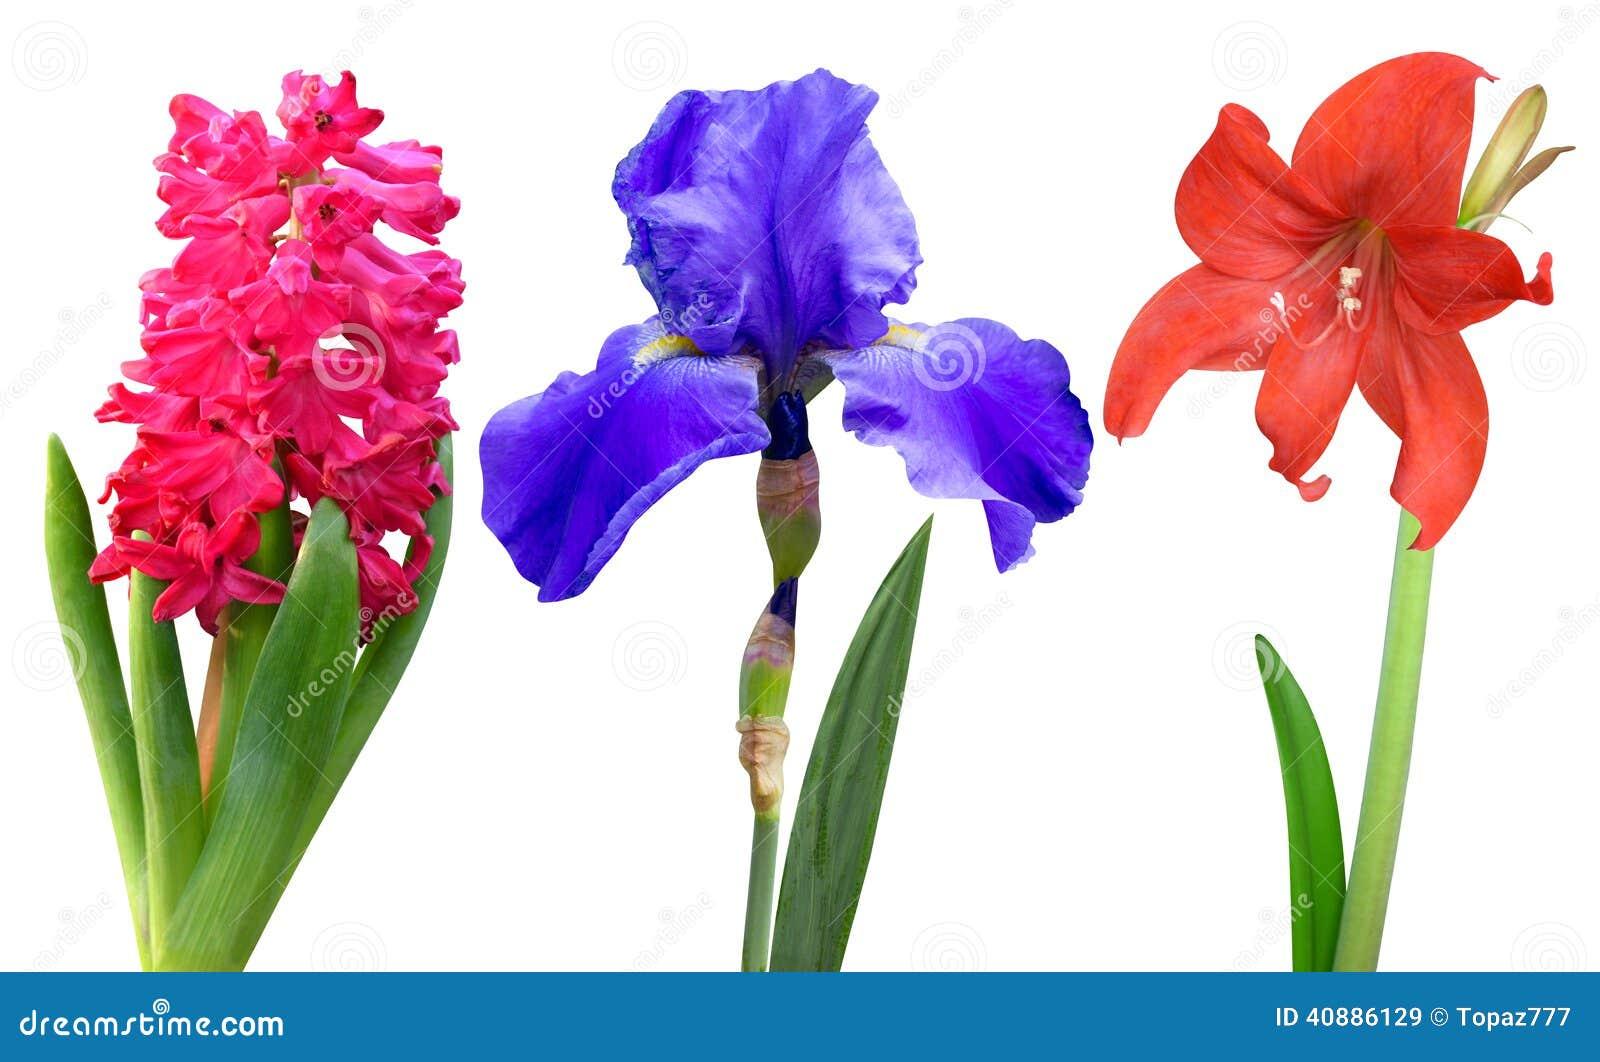 Hyacinth Iris Lily Stock Image Image Of Lily Flower 40886129